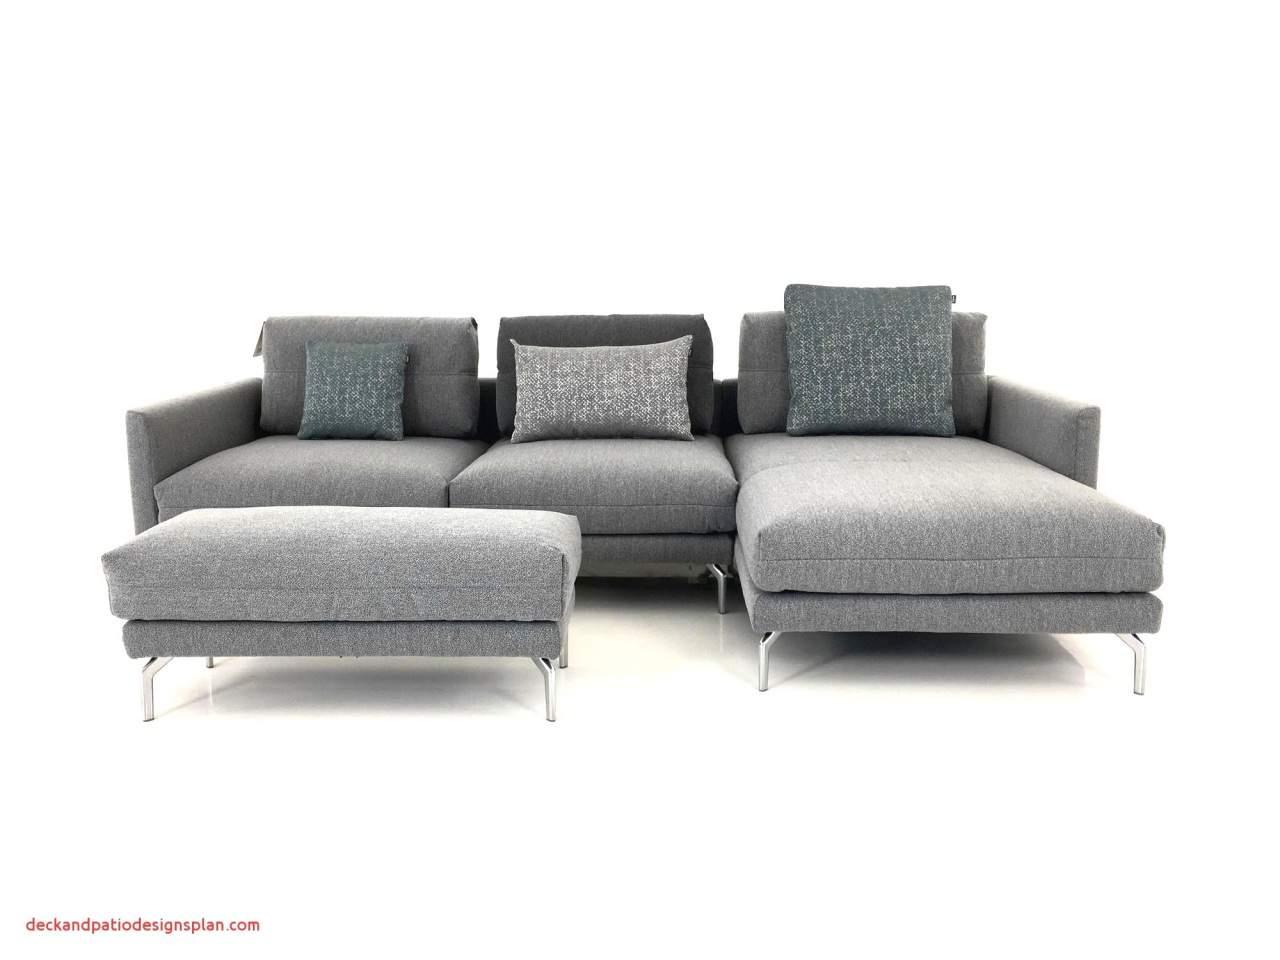 Zecken Im Garten Vernichten Einzigartig Rotes sofa Ikea